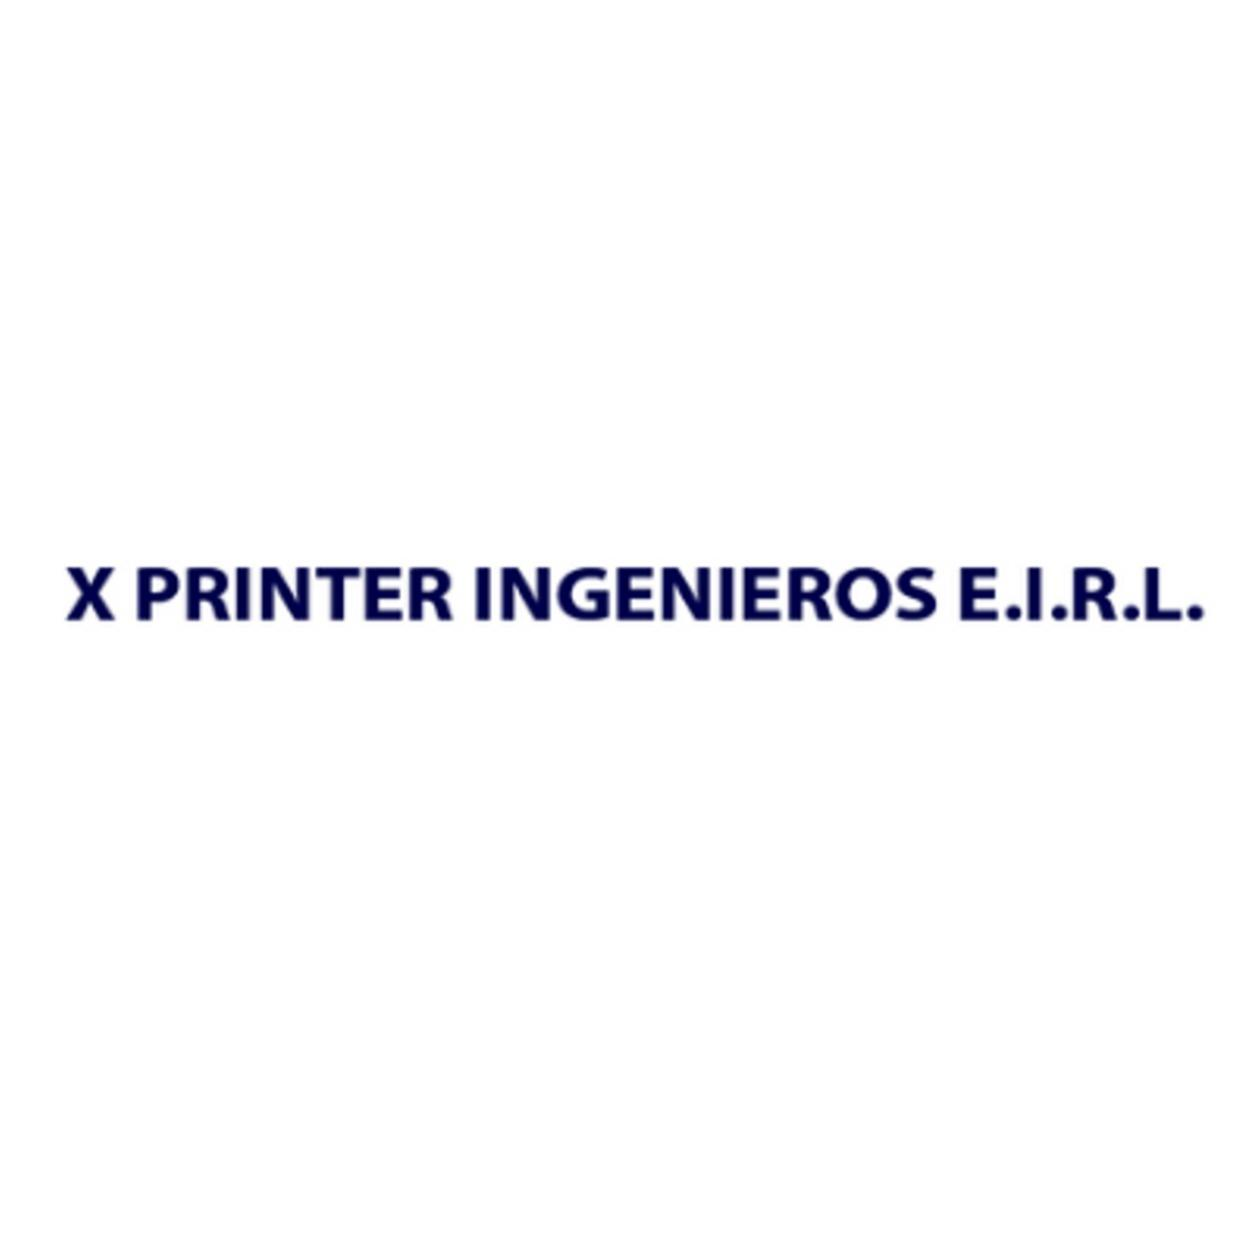 X Printer Ingenieros EIRL Callao